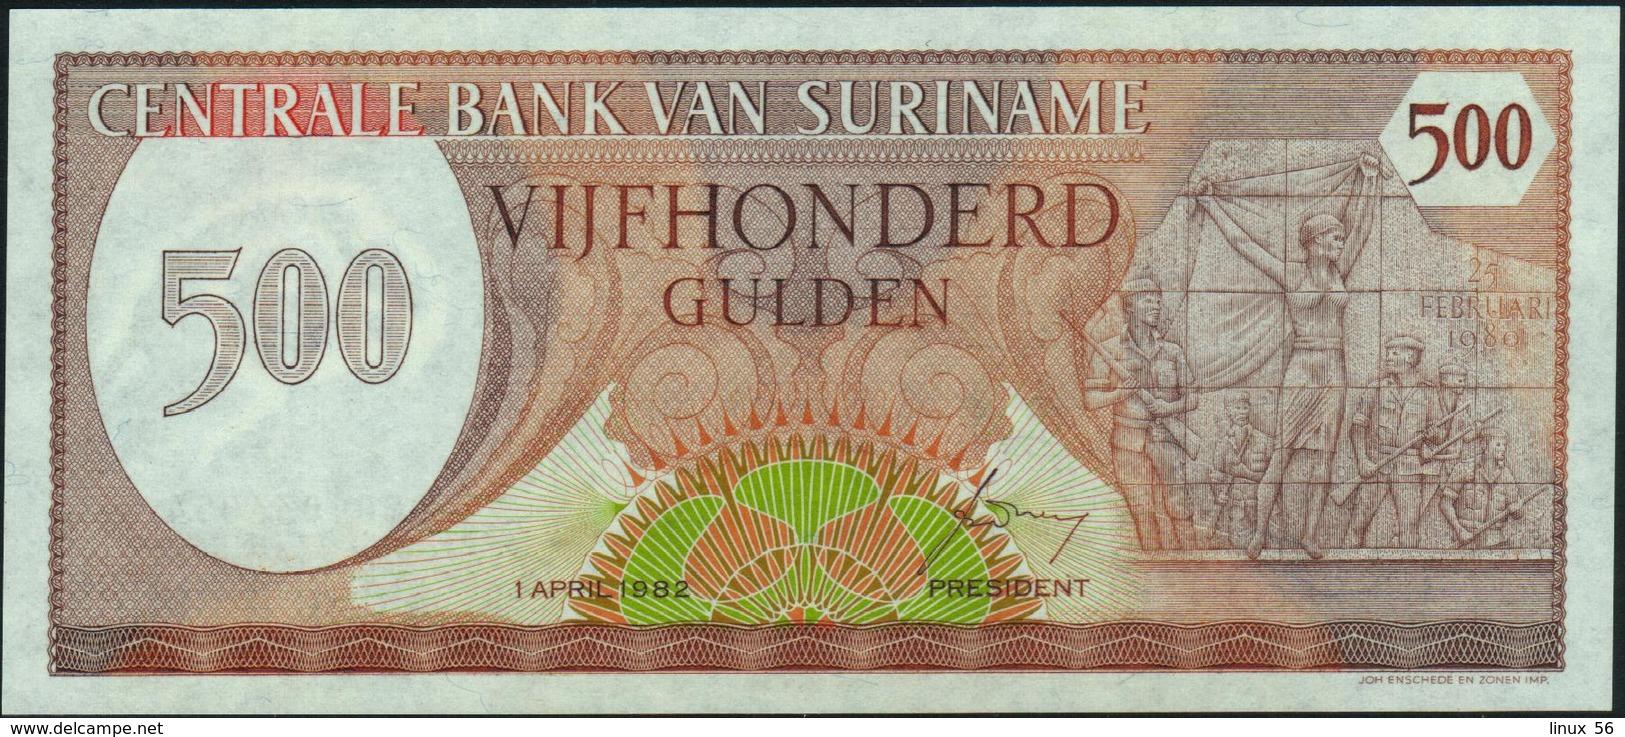 SURINAME - 500 Gulden 01.04.1982 UNC P.129 - Surinam